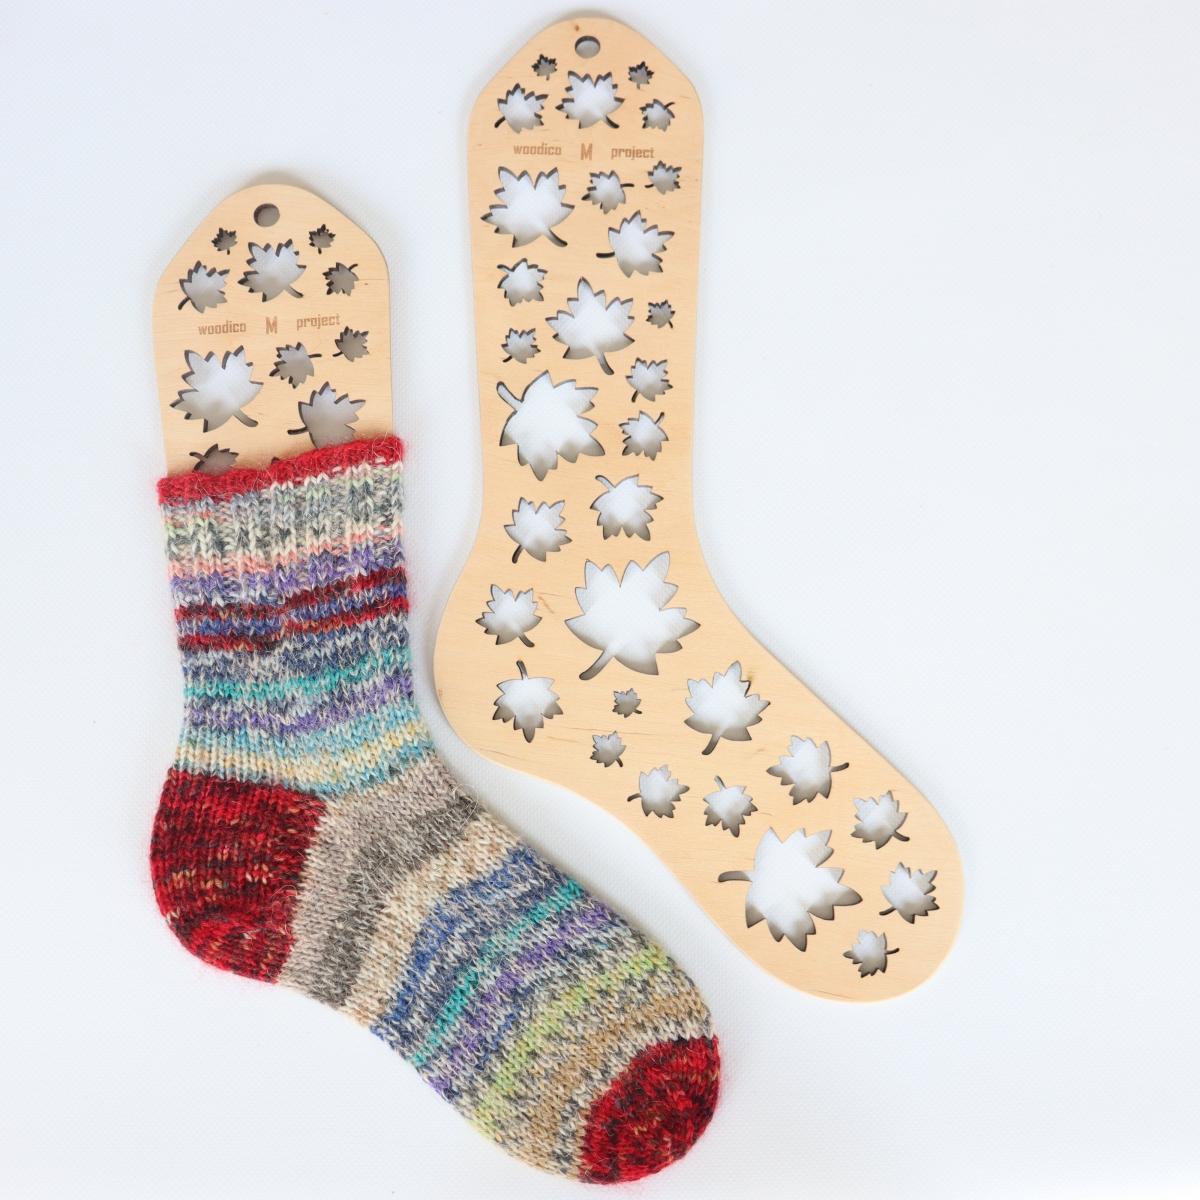 woodico.pro wooden sock blockers maple leaf 1200x1200 - Wooden sock blockers / Maple-Leaf